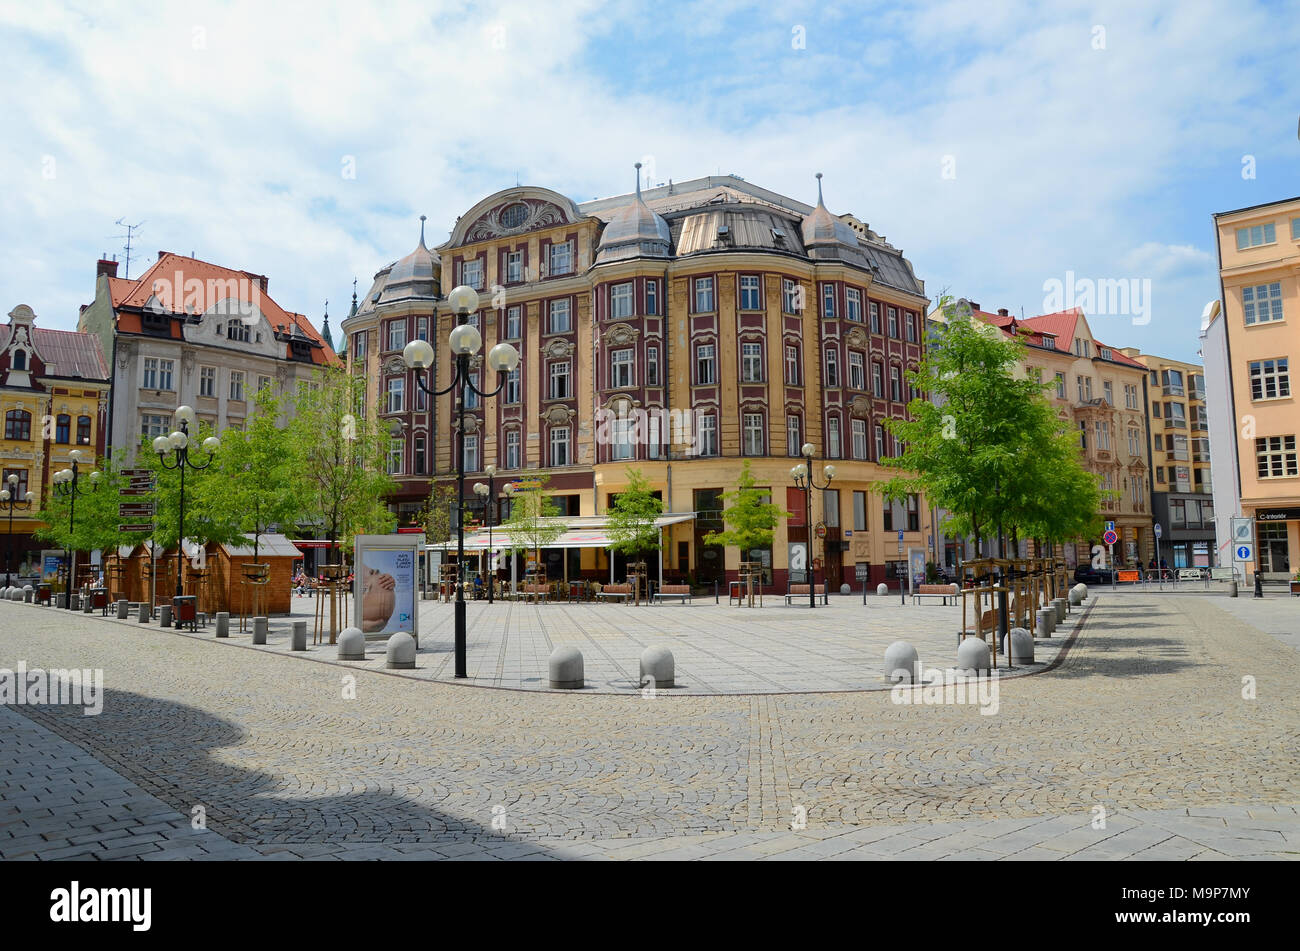 Building in Ostrava, Czech Republic - Stock Image